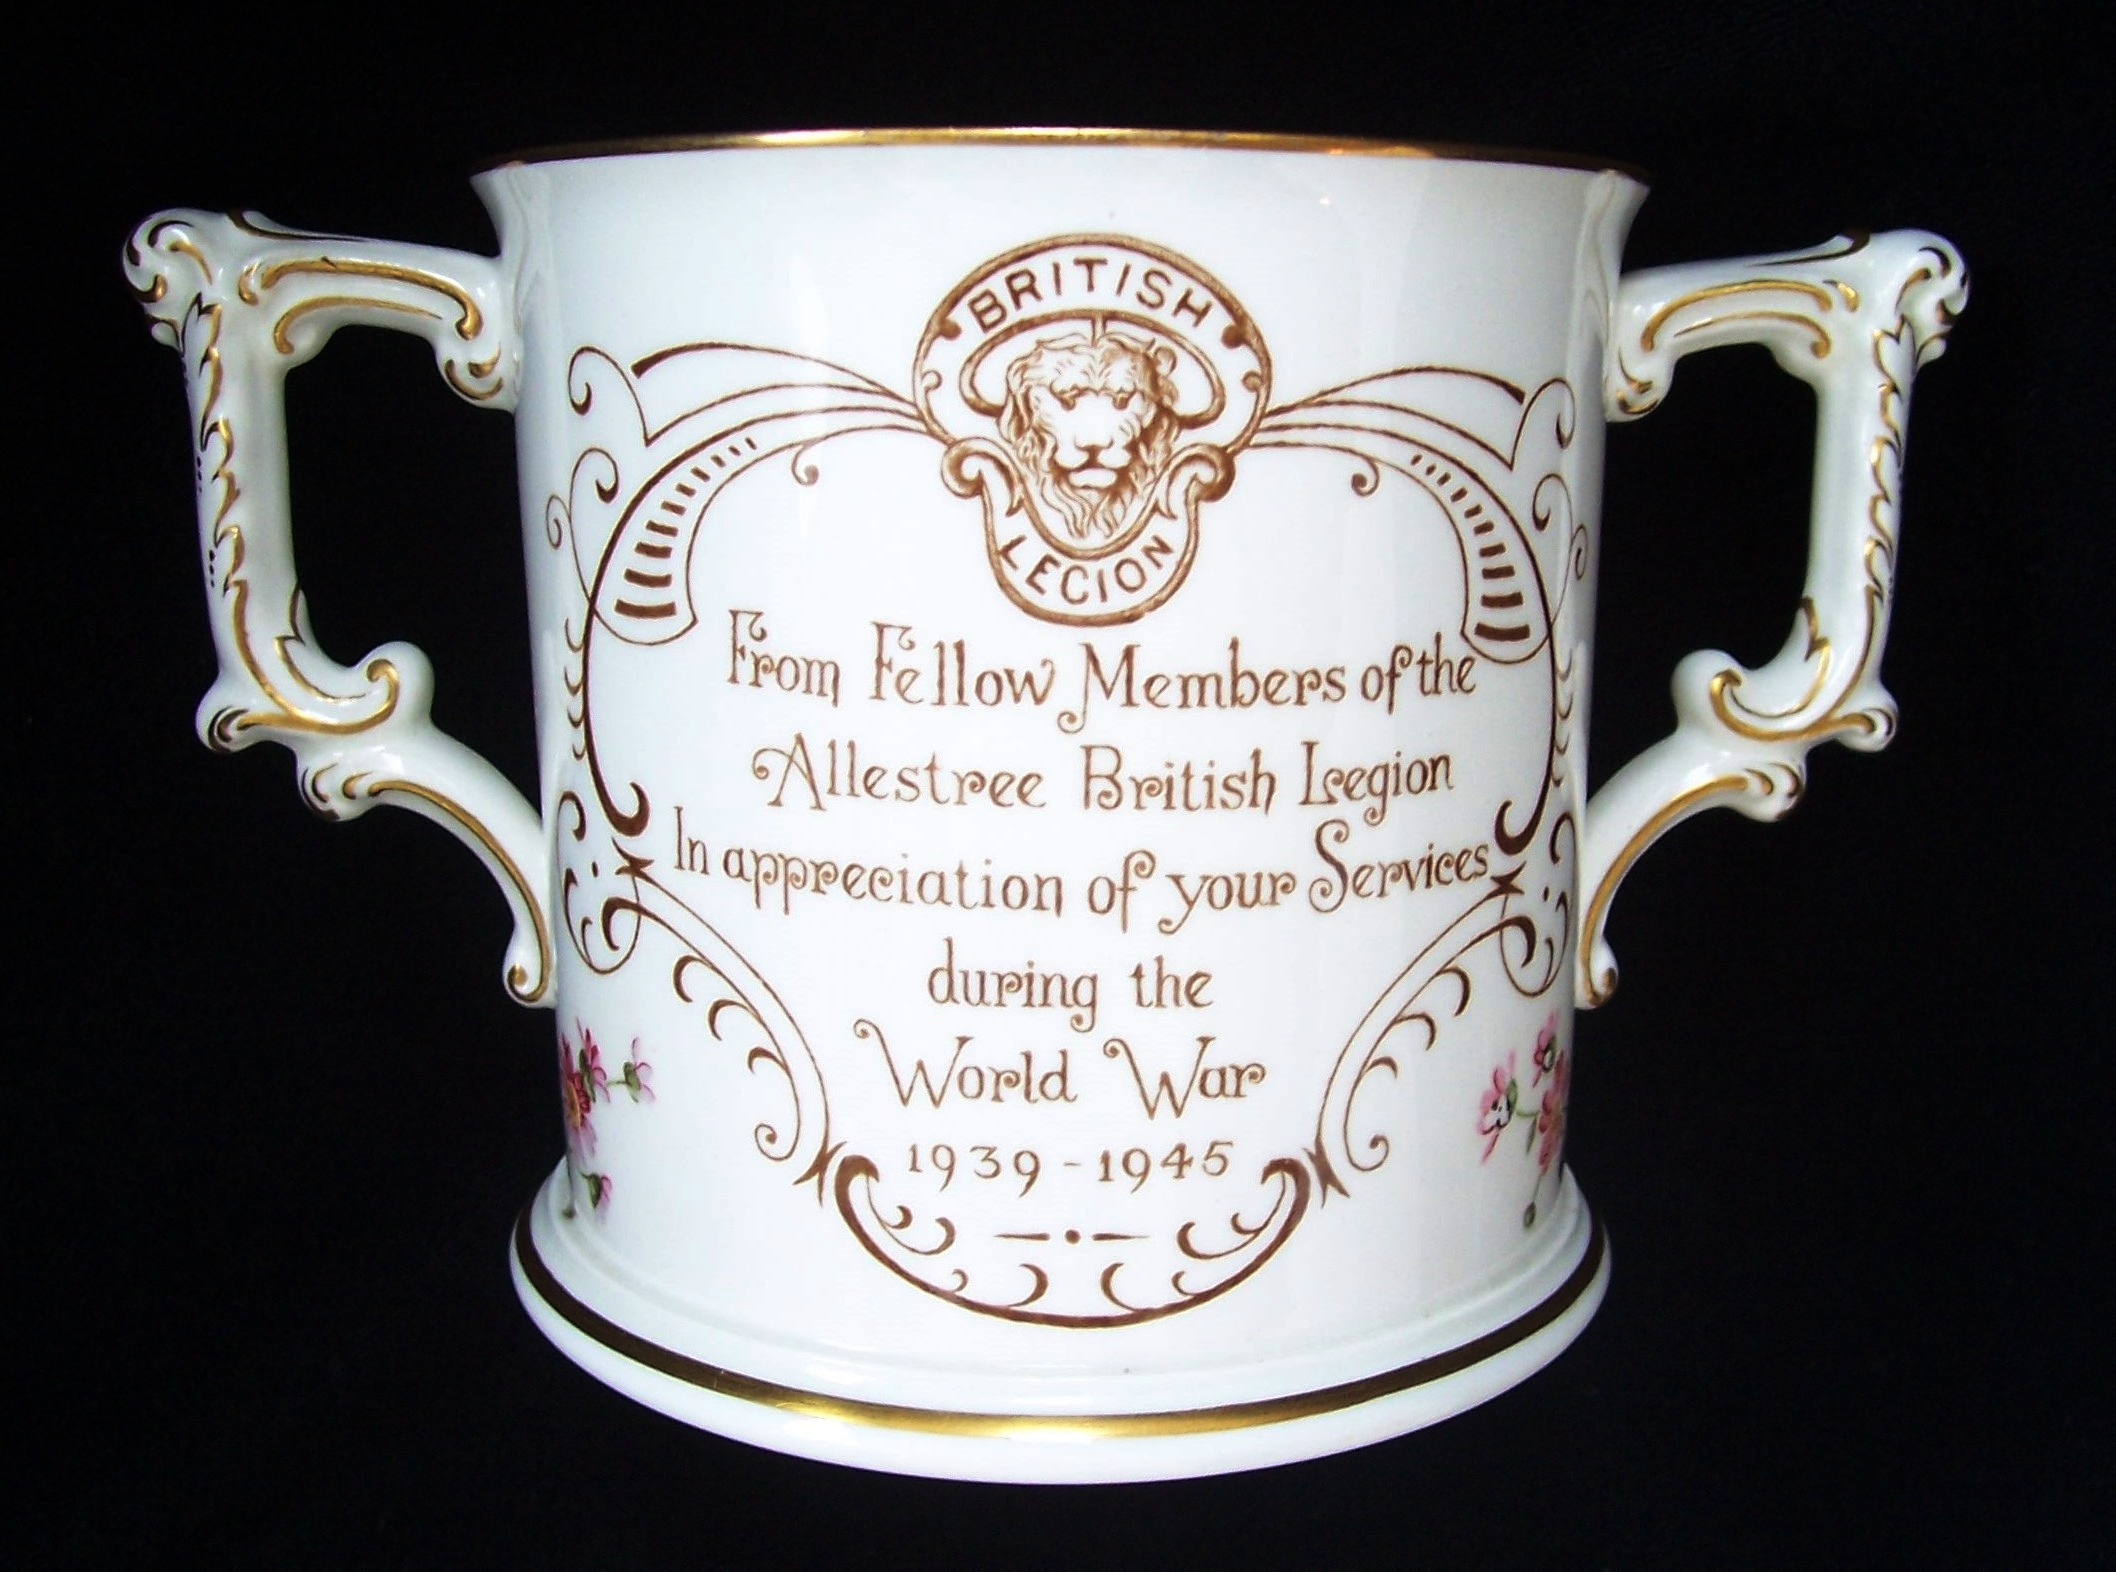 royal-crown-derby-allestree-british-legion-loving-cup-tom-and-edith-sis-rawlings-inscription